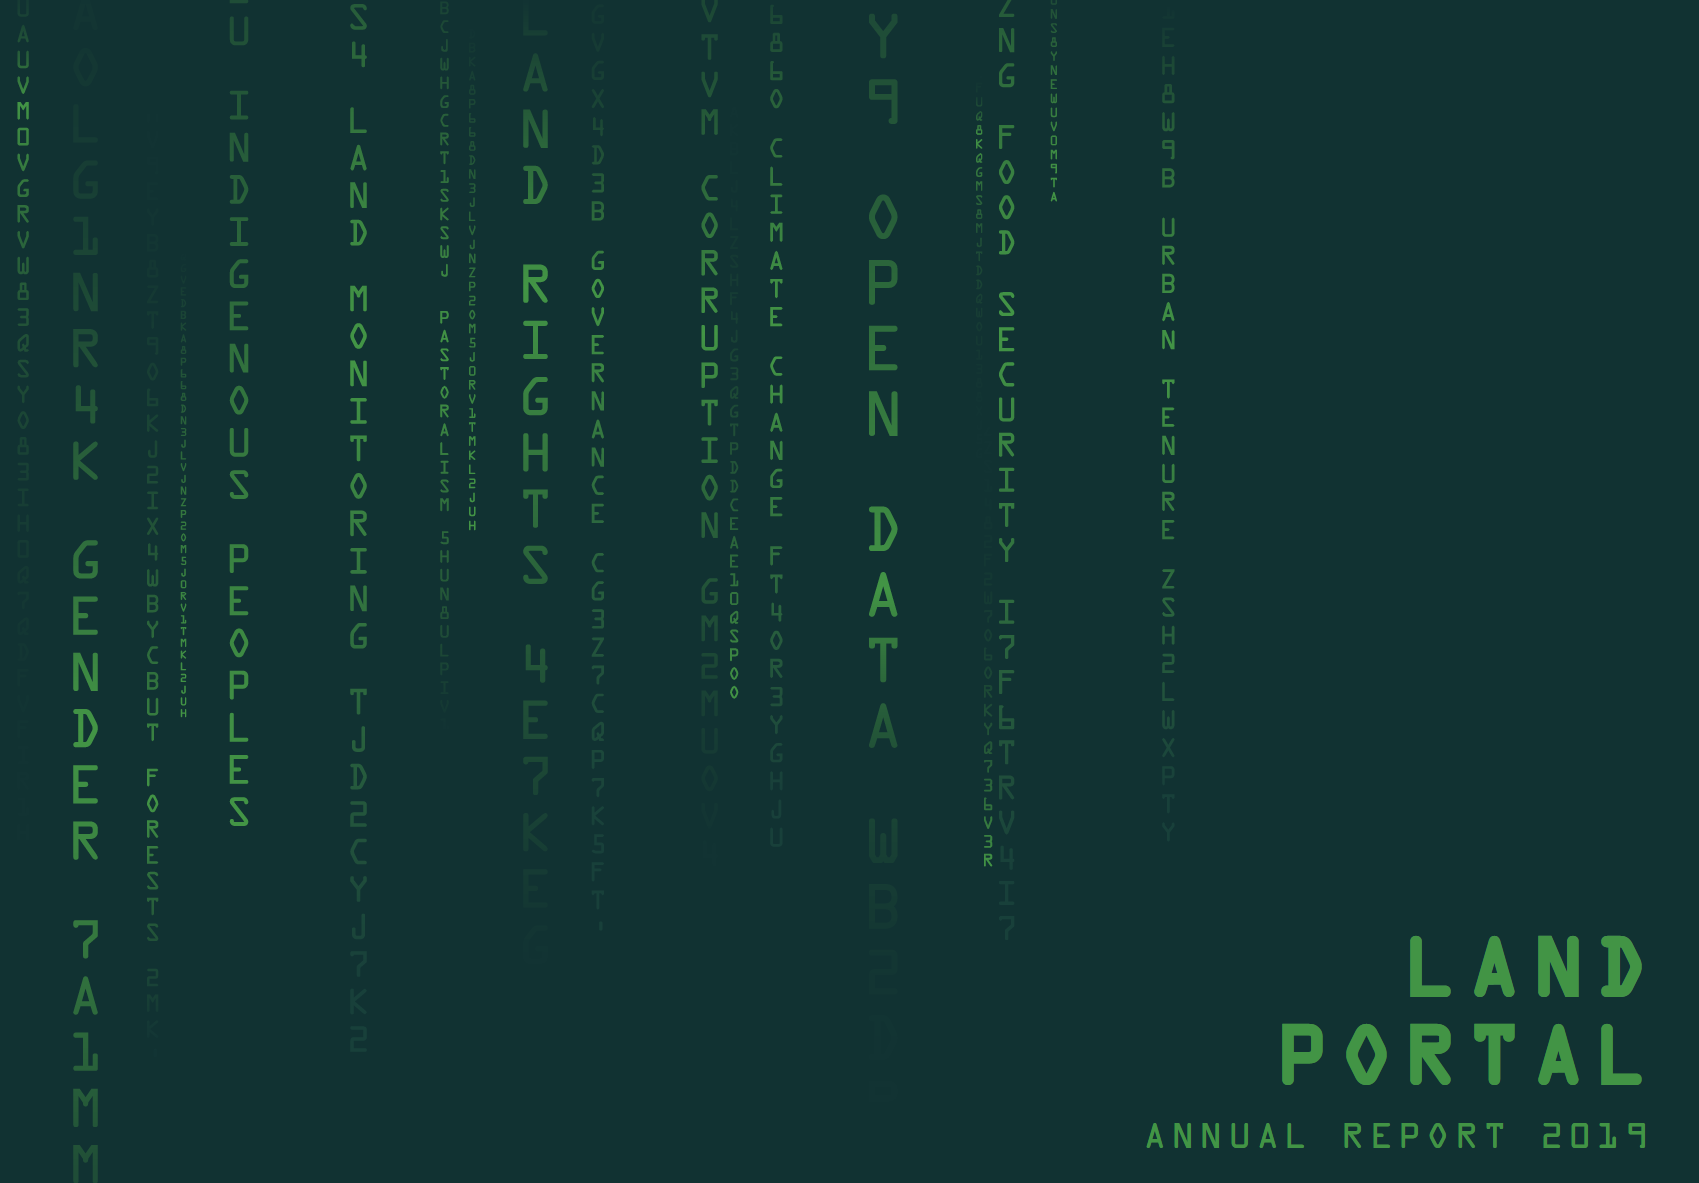 Land Portal Annual Report 2019